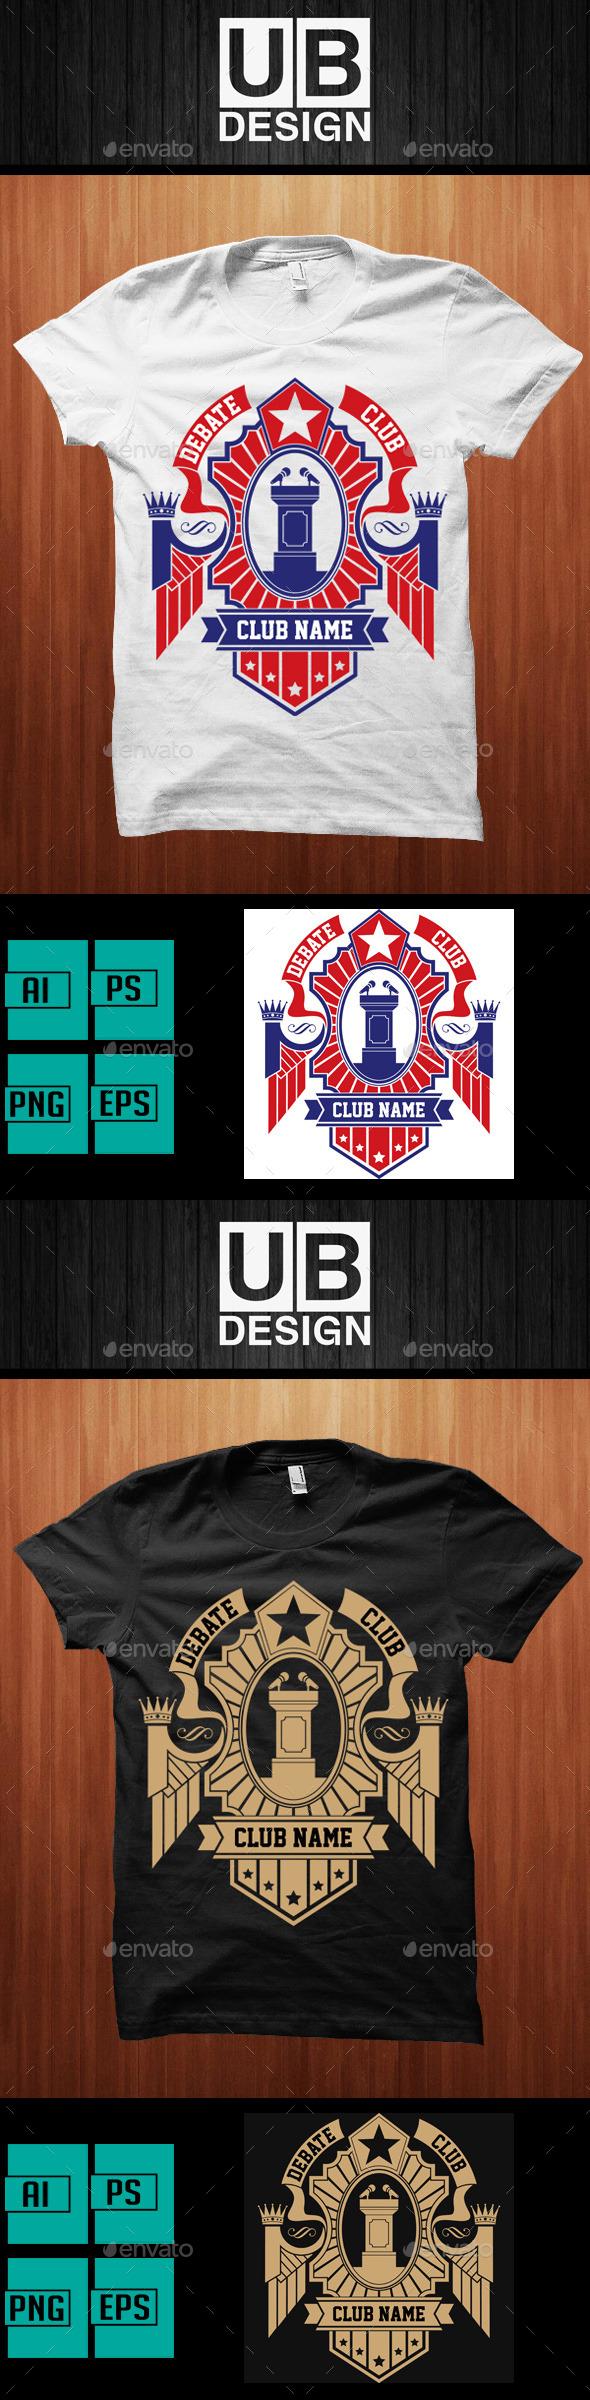 Debate Club Shirt - Academic T-Shirts